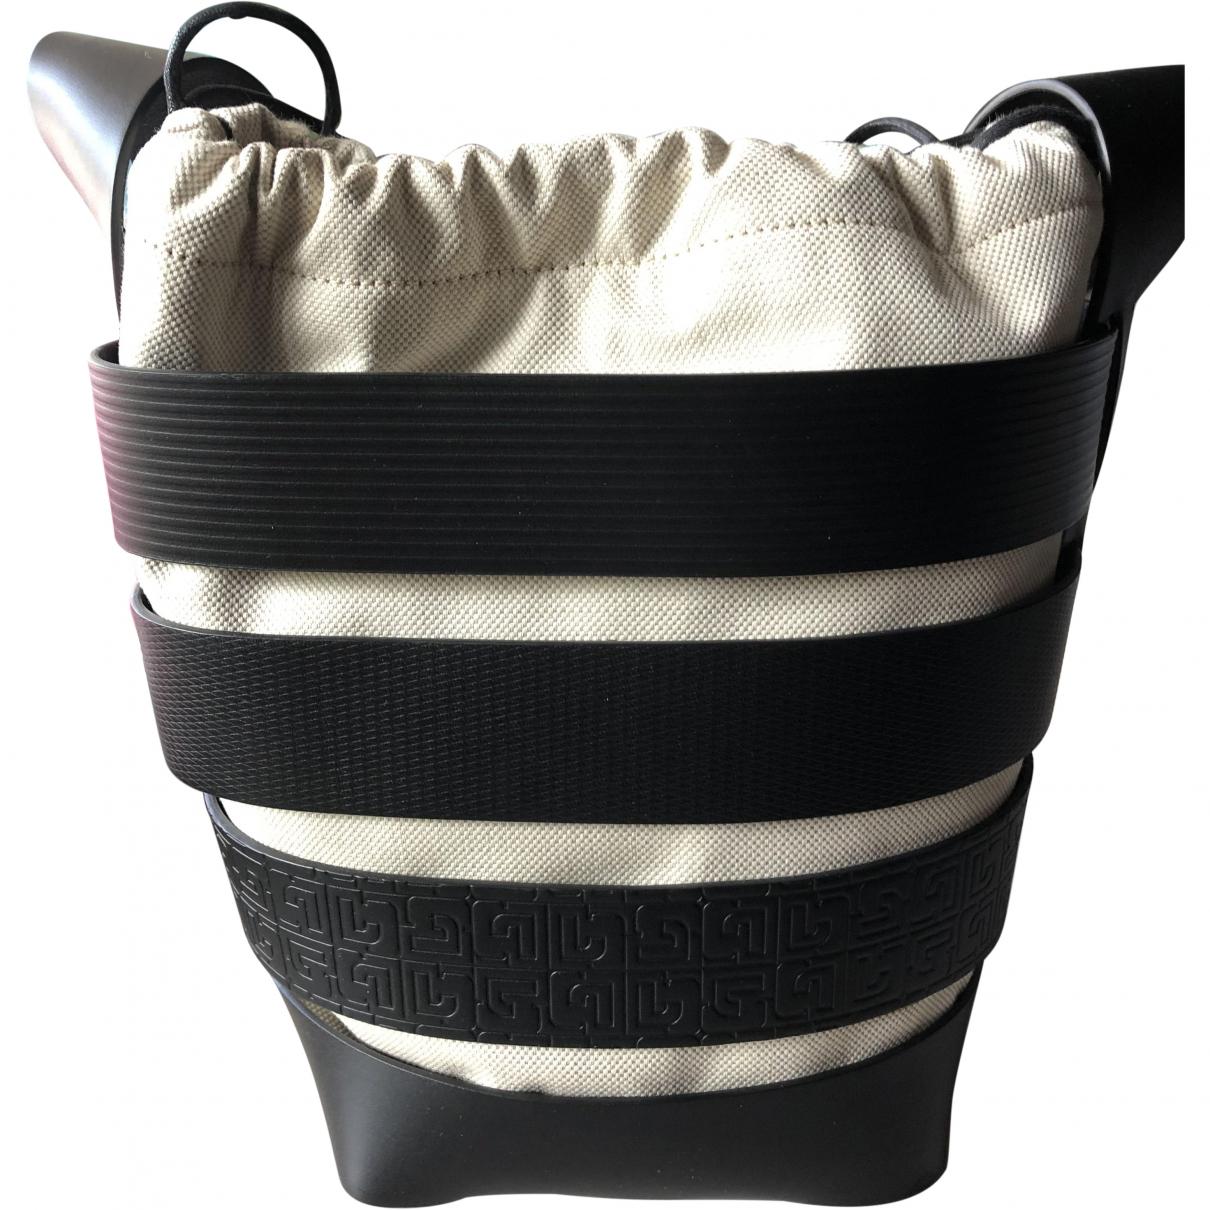 Paco Rabanne \N Black Leather handbag for Women \N